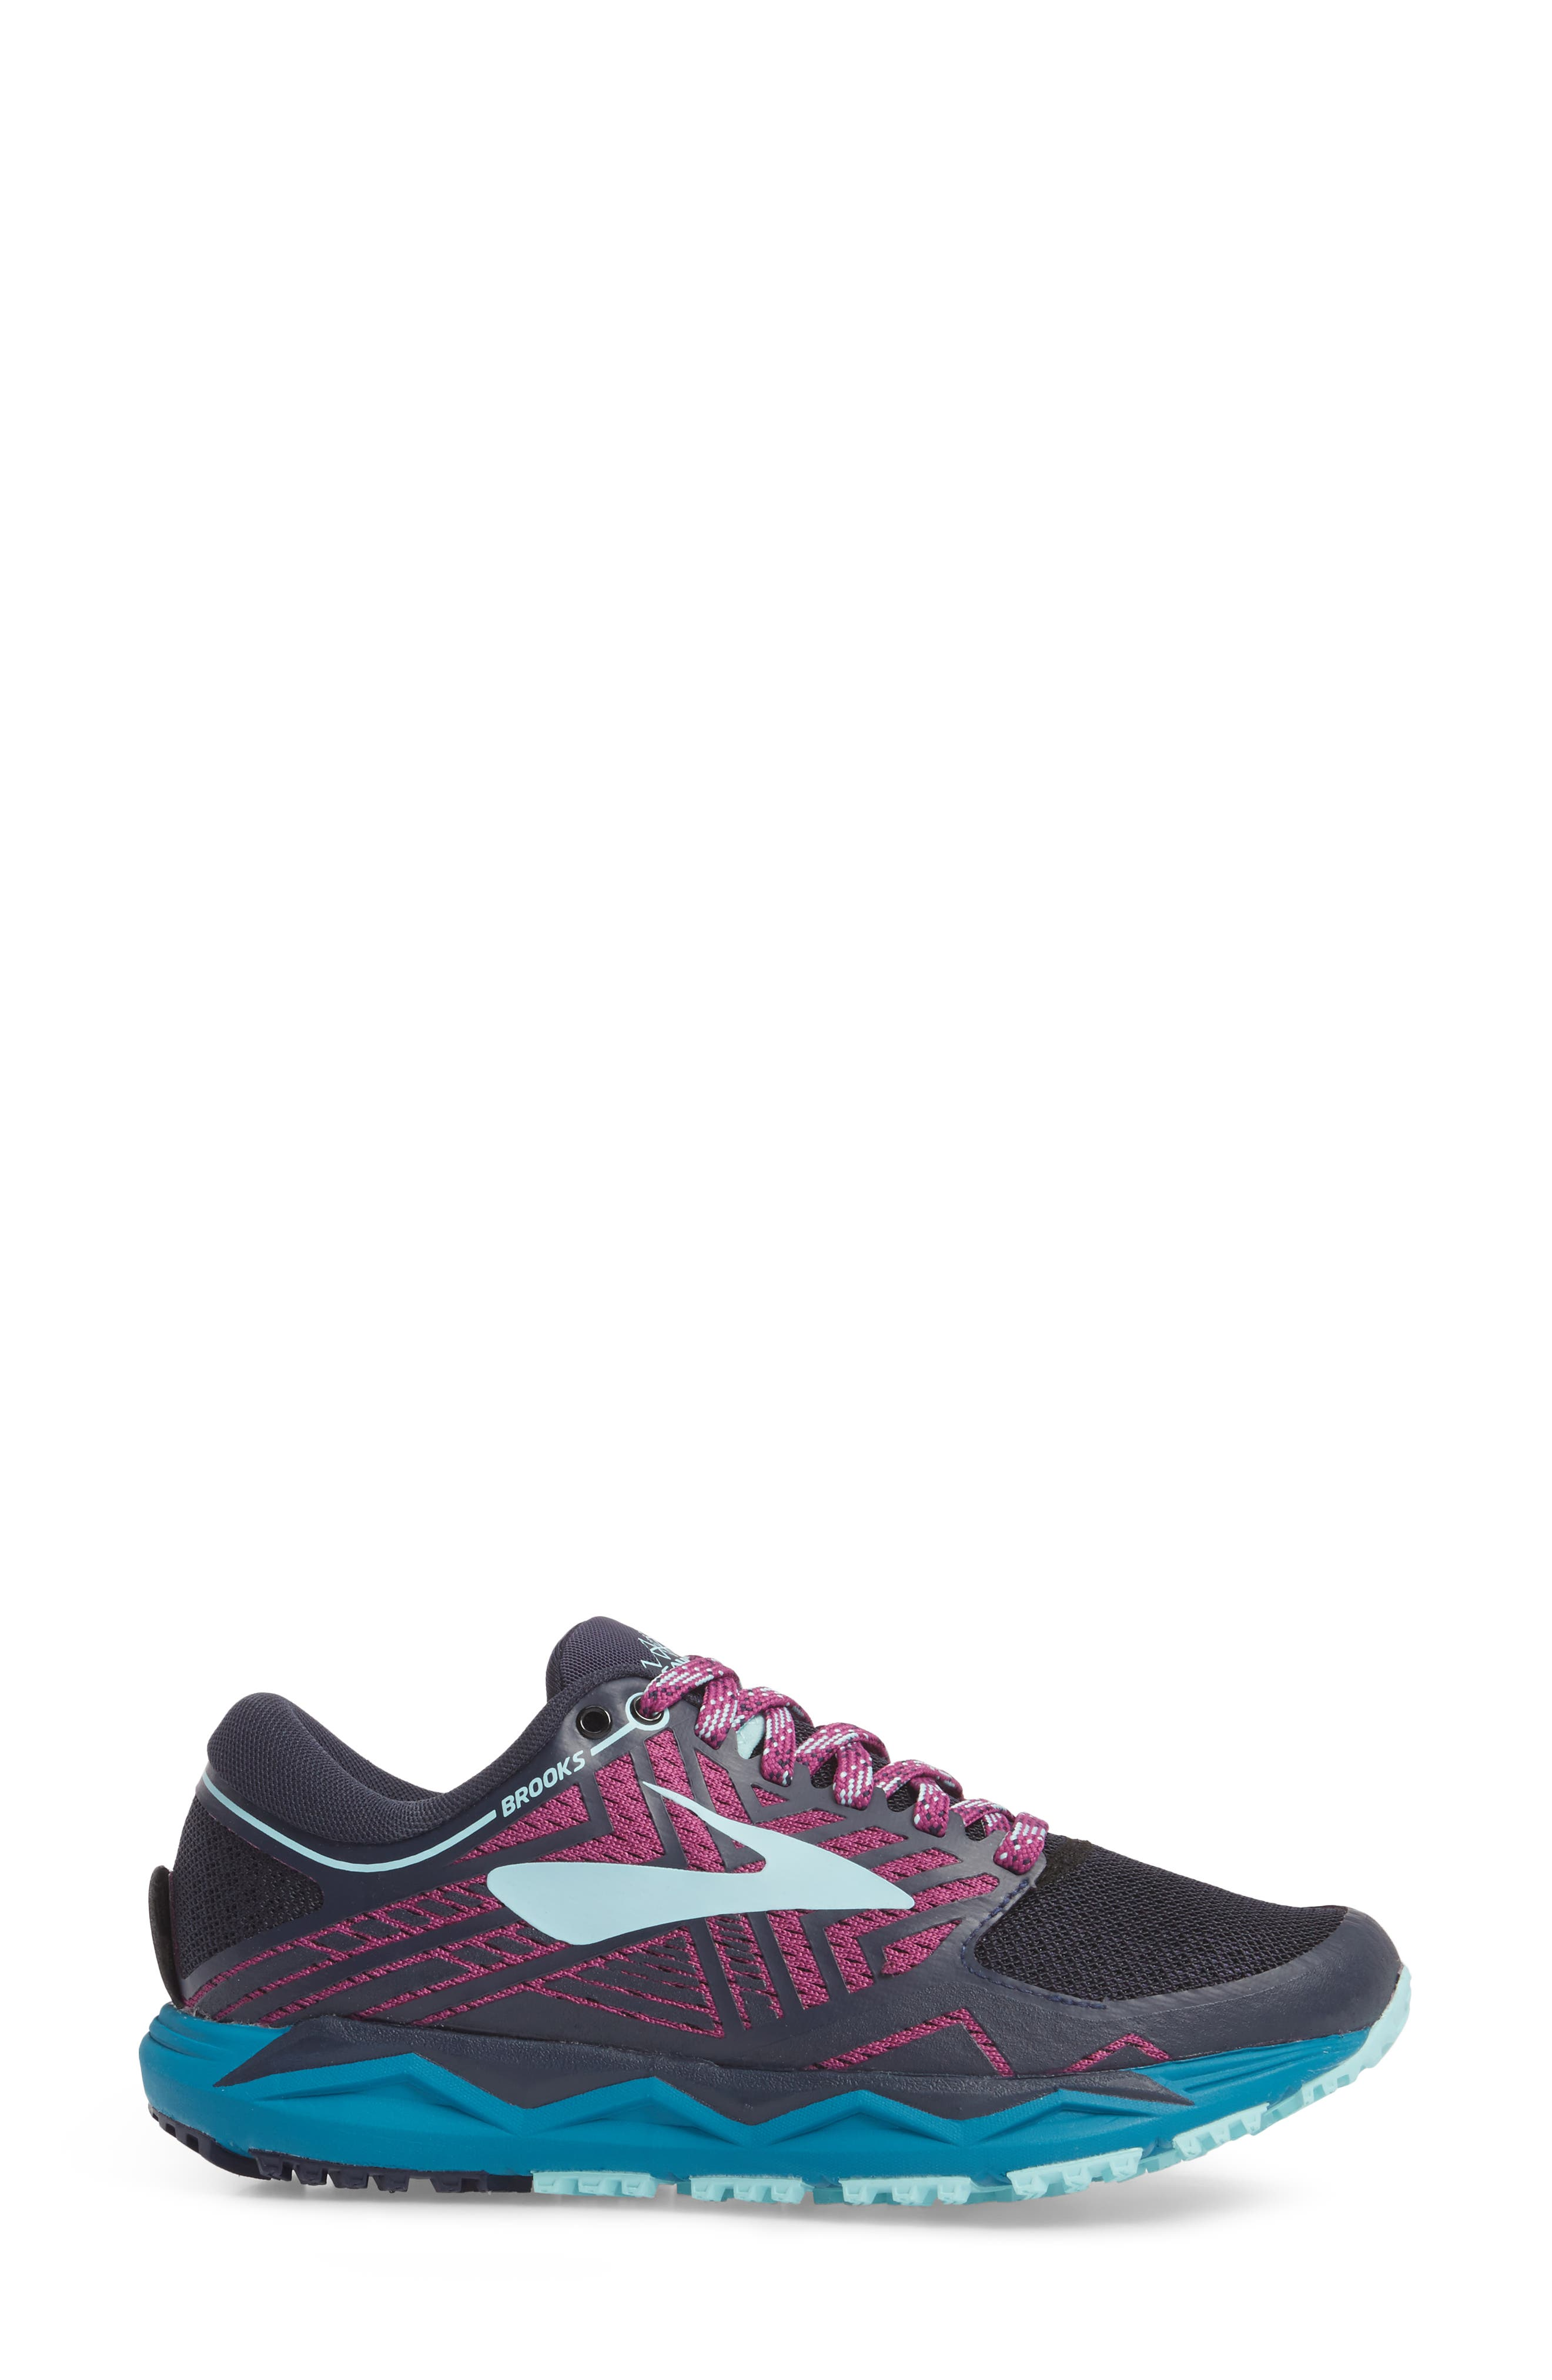 ,                             Caldera 2 Trail Running Shoe,                             Alternate thumbnail 3, color,                             NAVY/ PLUM/ ICE BLUE